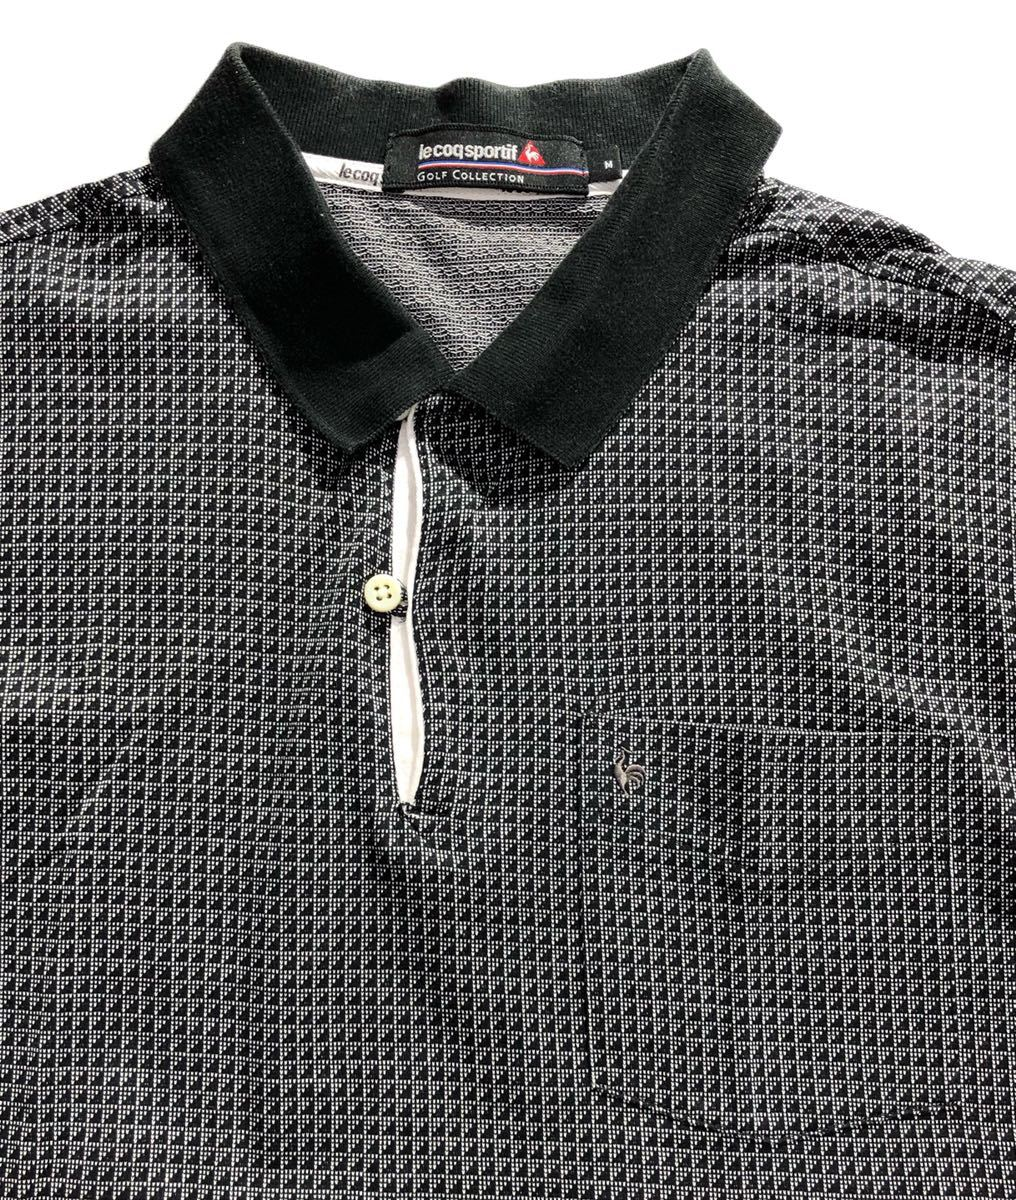 《le coq sportif GOLF ルコックゴルフ》ロゴ刺繍 総柄 半袖 ポロシャツ グレー×ブラック M_画像4